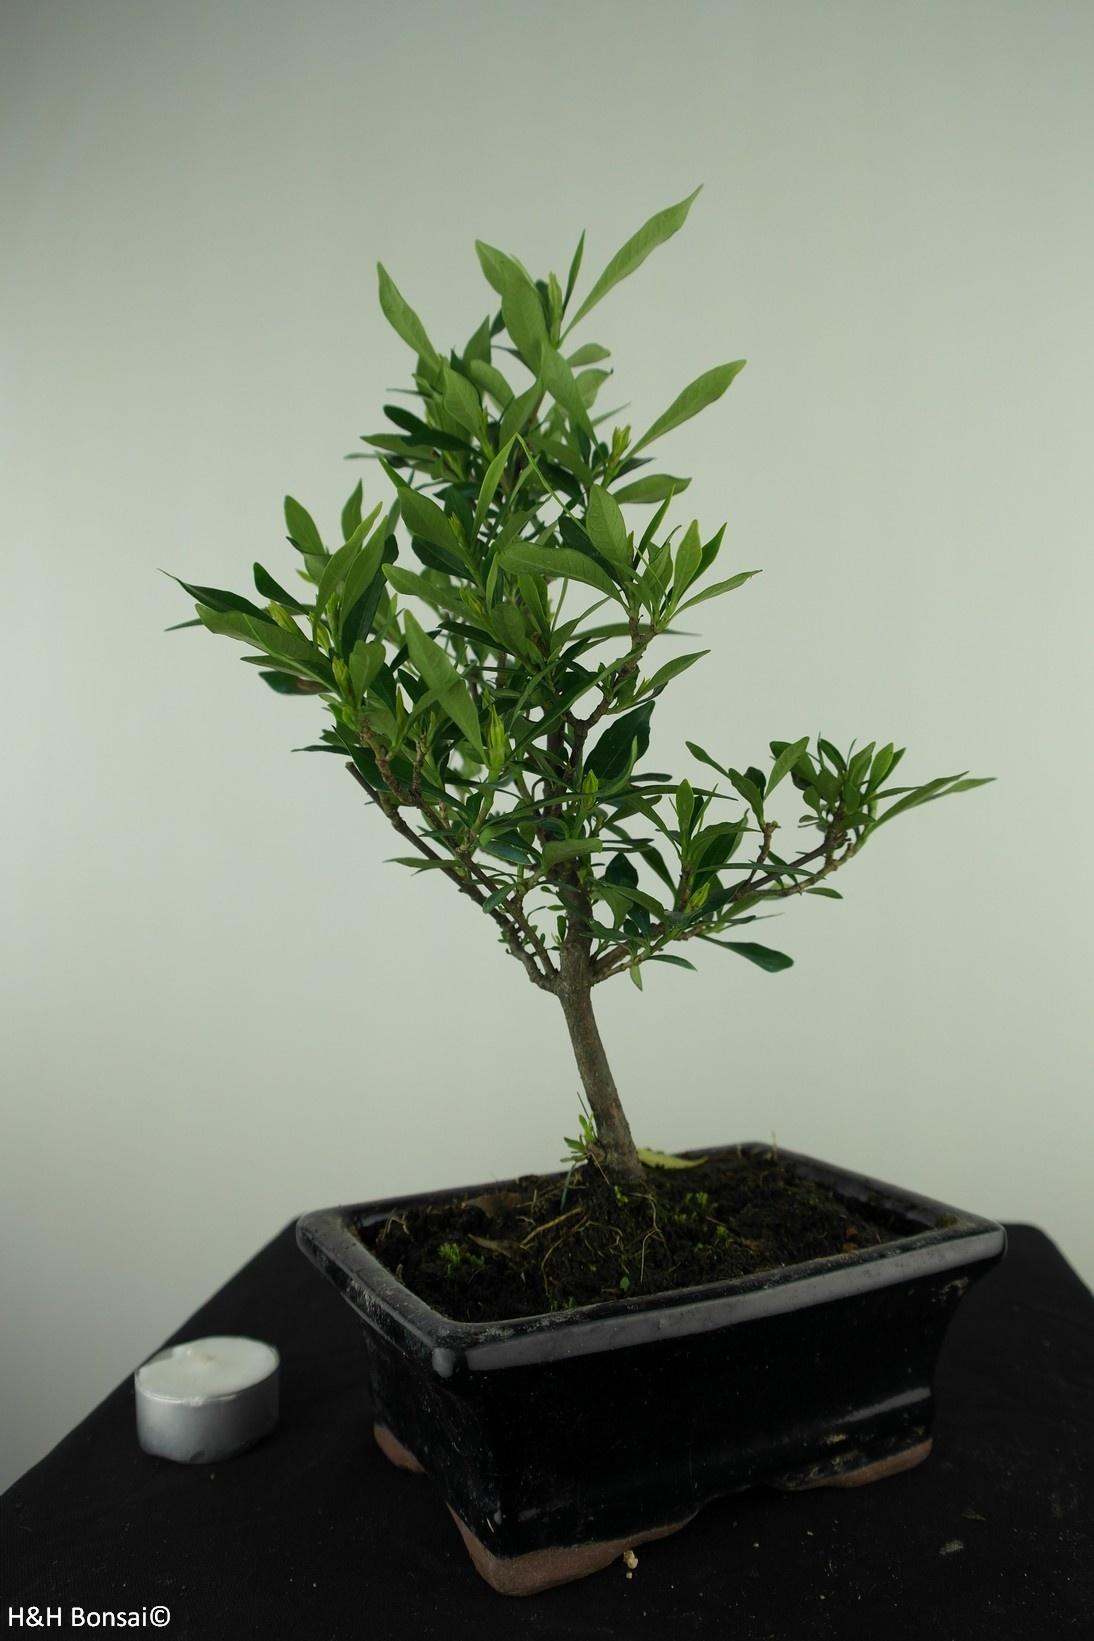 Bonsai Gardenie, Gardenia jasminoides, nr. 7698